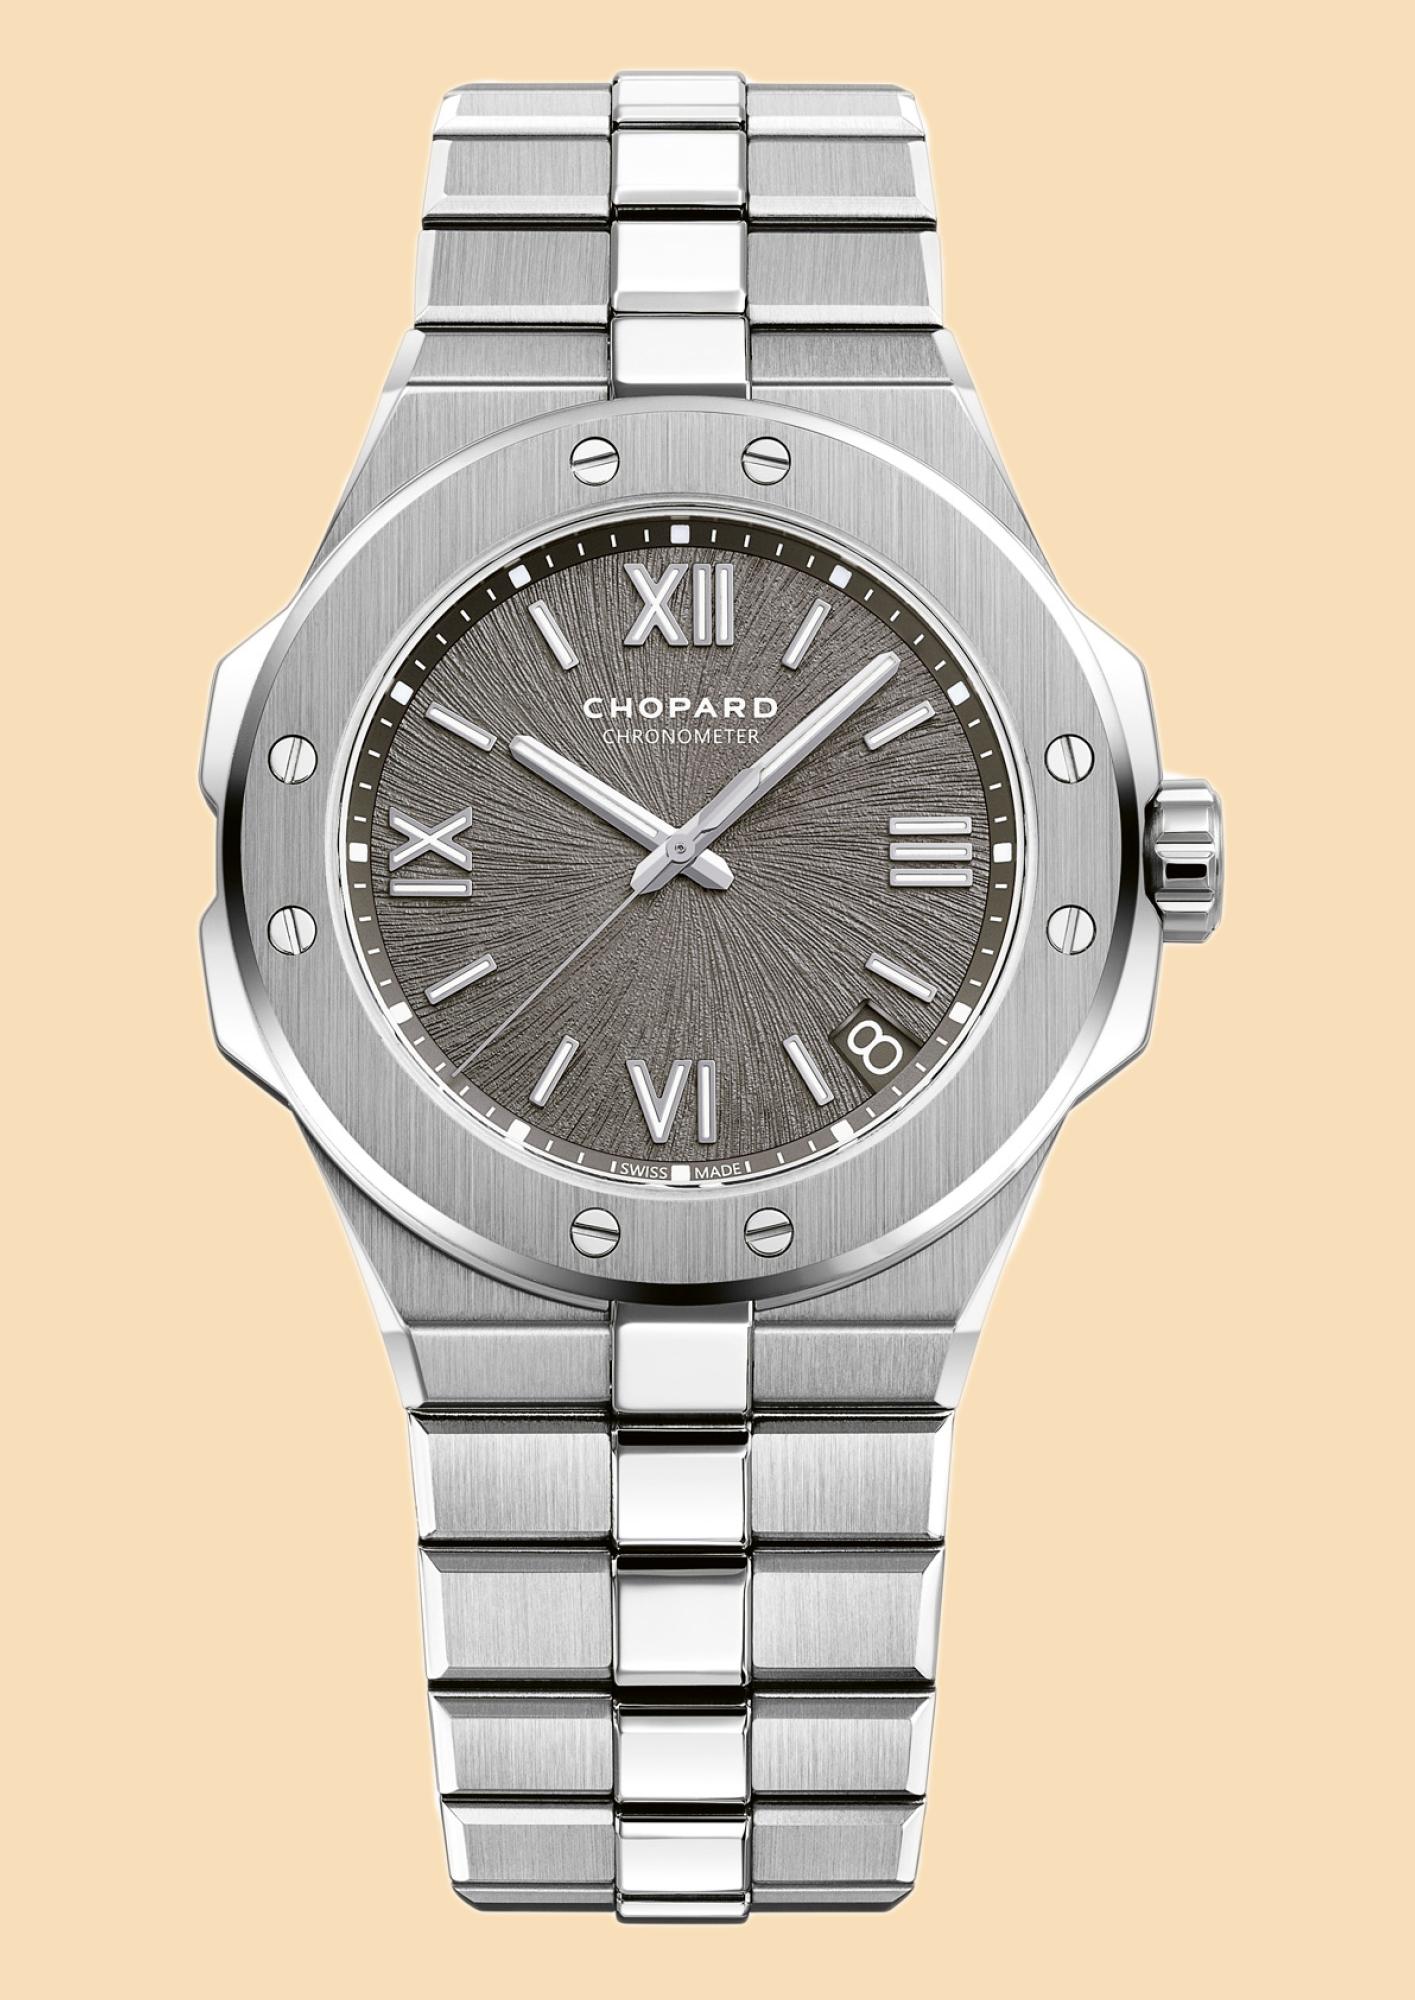 Chopard's Alpine Eagle watch